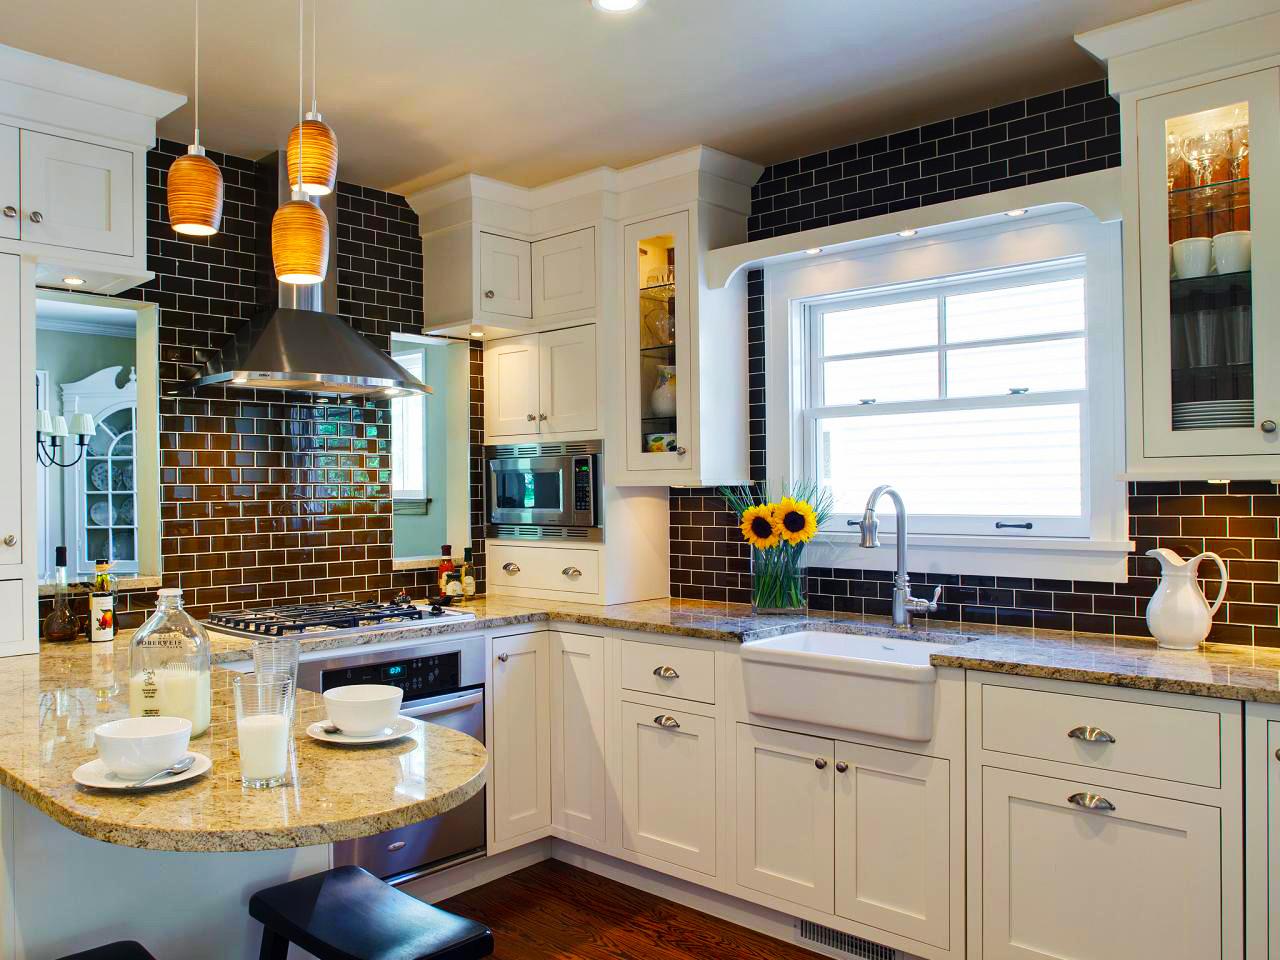 Kitchen Subway Tile Backsplash Designs  Cost to Remodel Kitchen Backsplash Designs